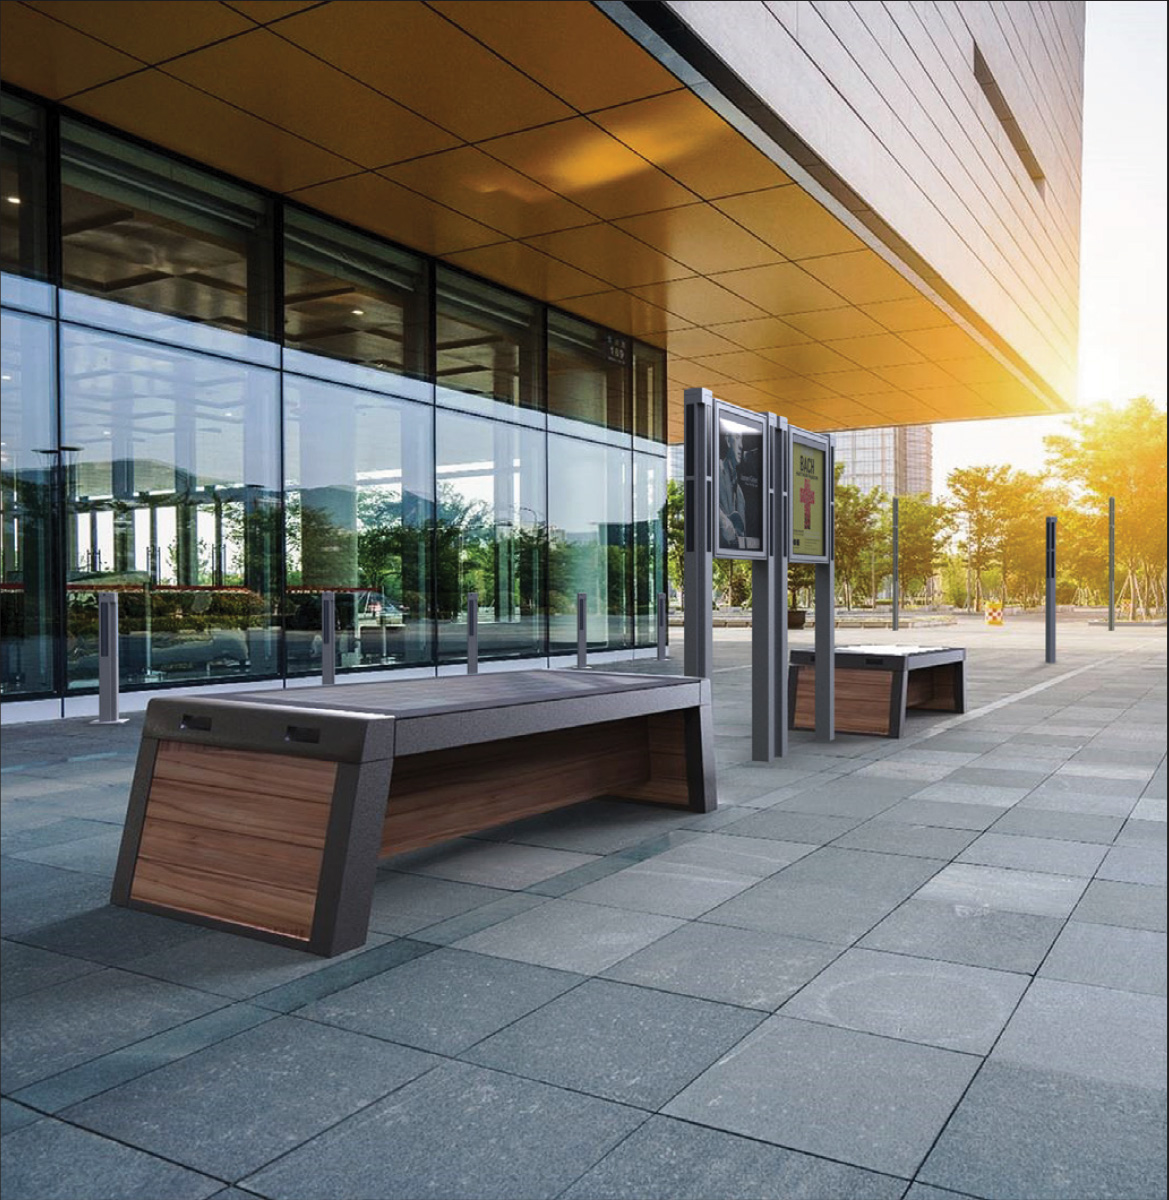 Solar Smart Bench